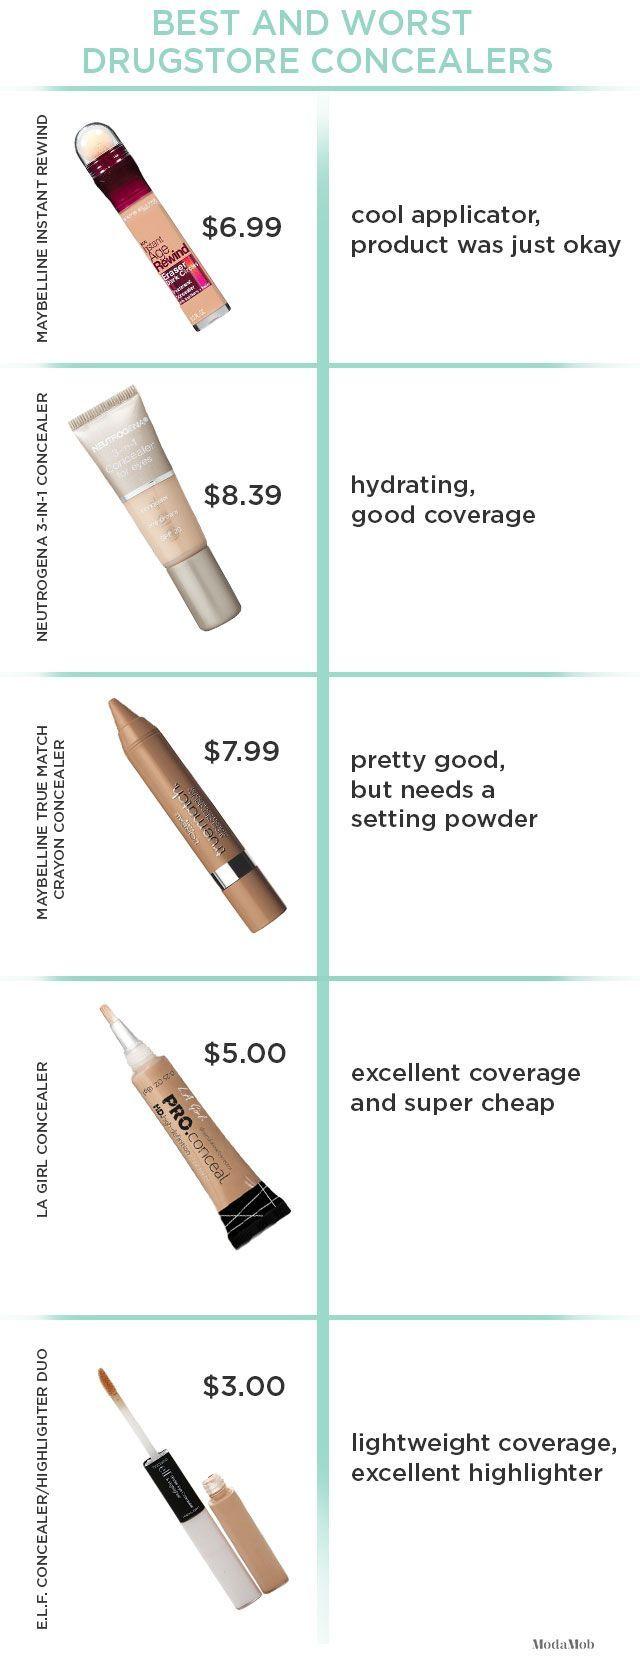 Best Drugstore Concealers: Neutrogena 3-in-1 Concealer | Maybelline Lumi Touch concealer } Maybelline Instant Age Rewind Concealer | L'OREAL True Match Crayon Concealer | LA Girl Brand Concealers | e.l.f Studio Under Eye Concealer #drugstore #makeup